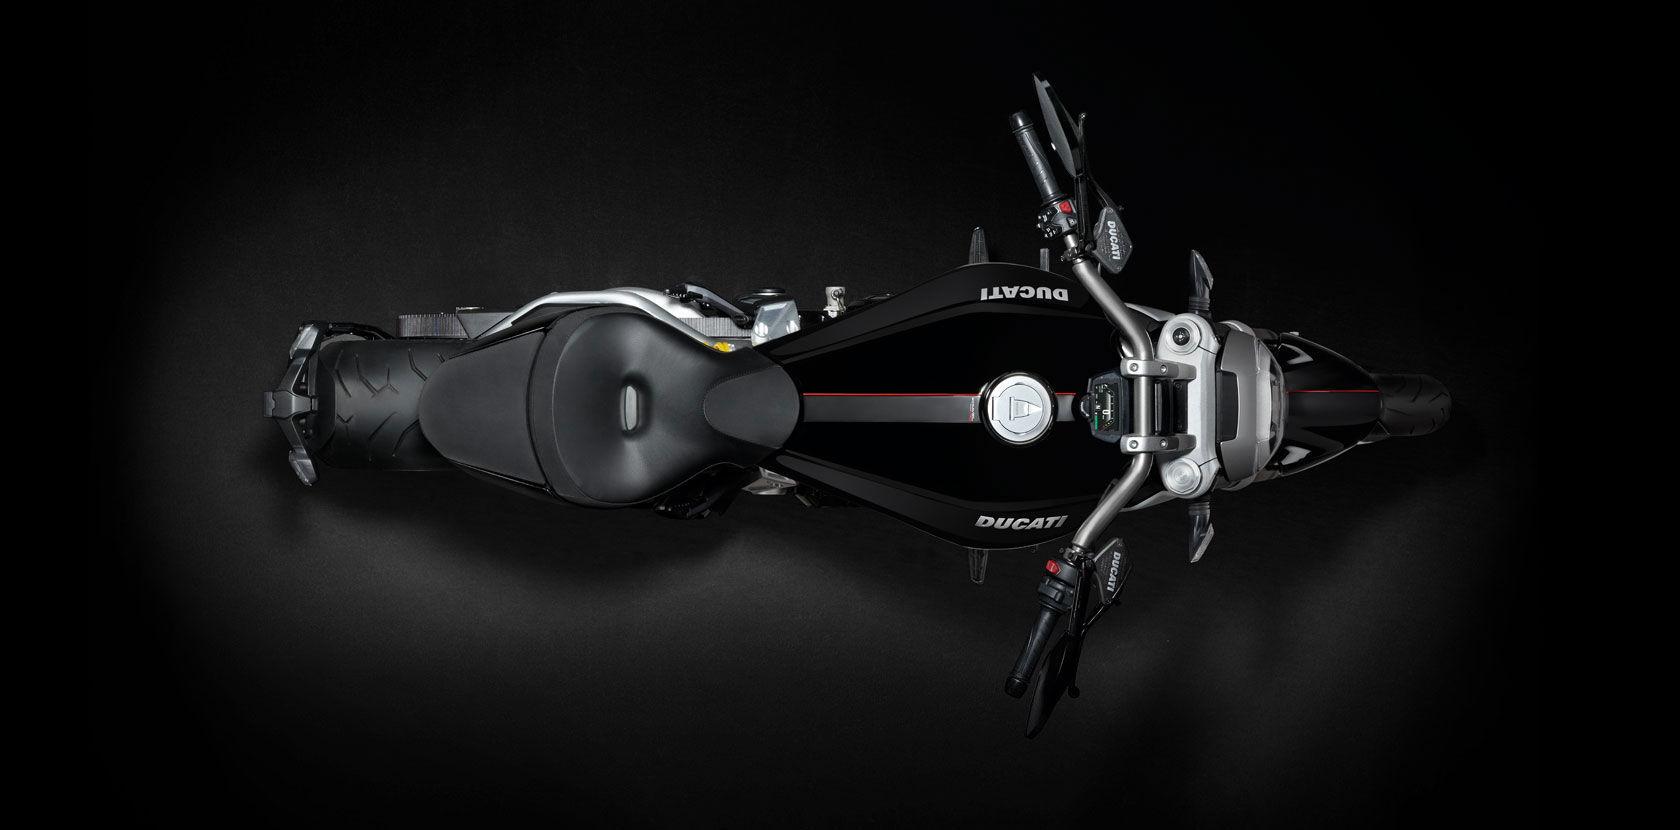 2016 Ducati XDiavel S | XDiavel - Top Shot